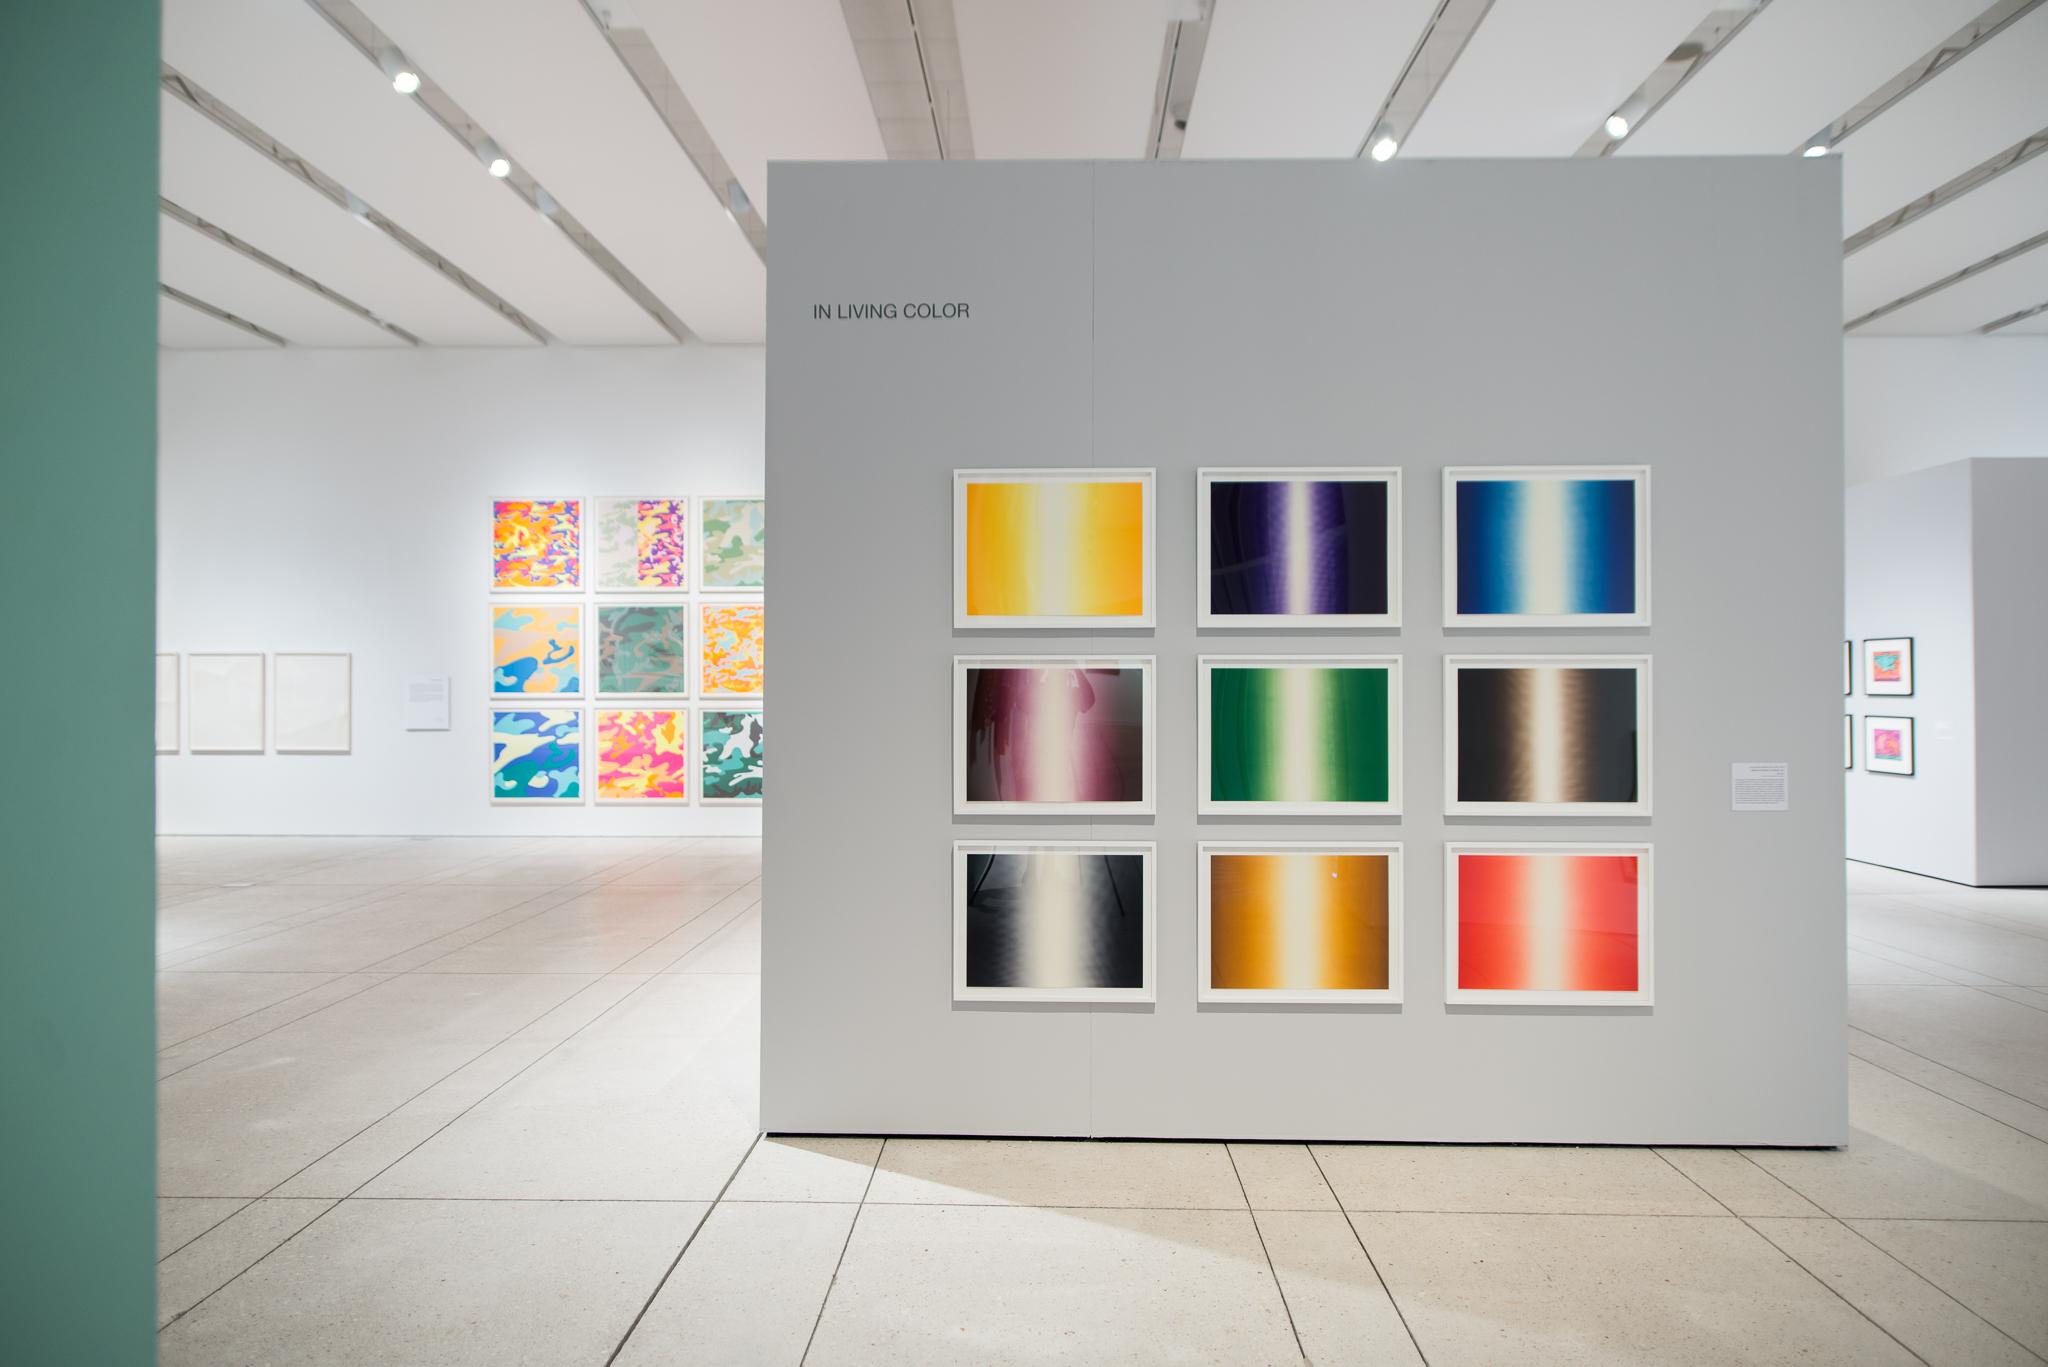 tampa museum--in living color, 23.jpg